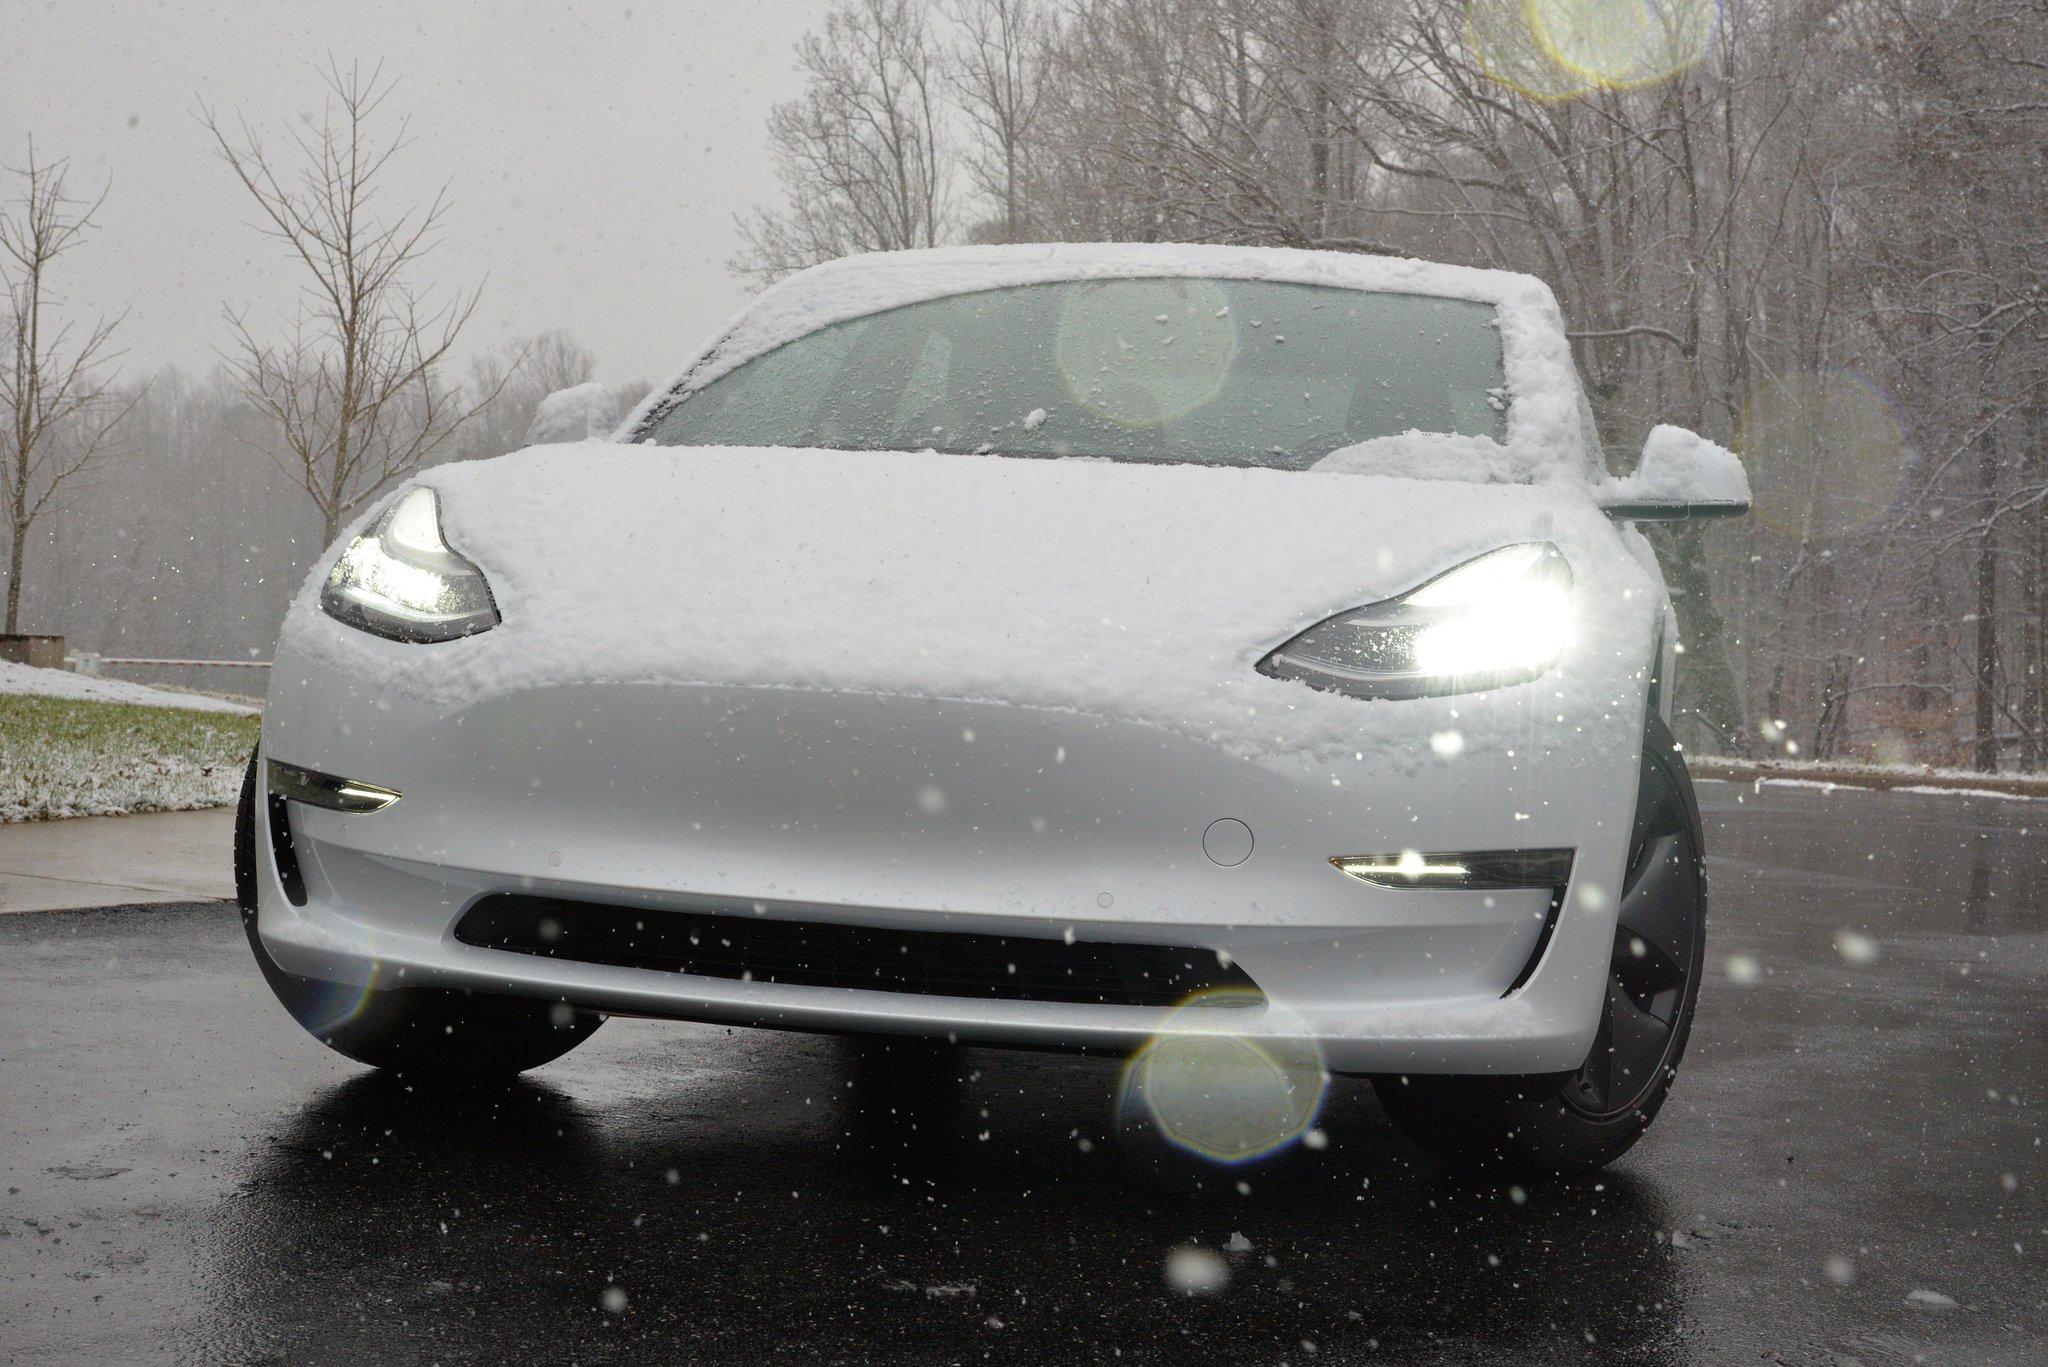 Tesla Model 3 headlights earn highest safety rating from IIHS